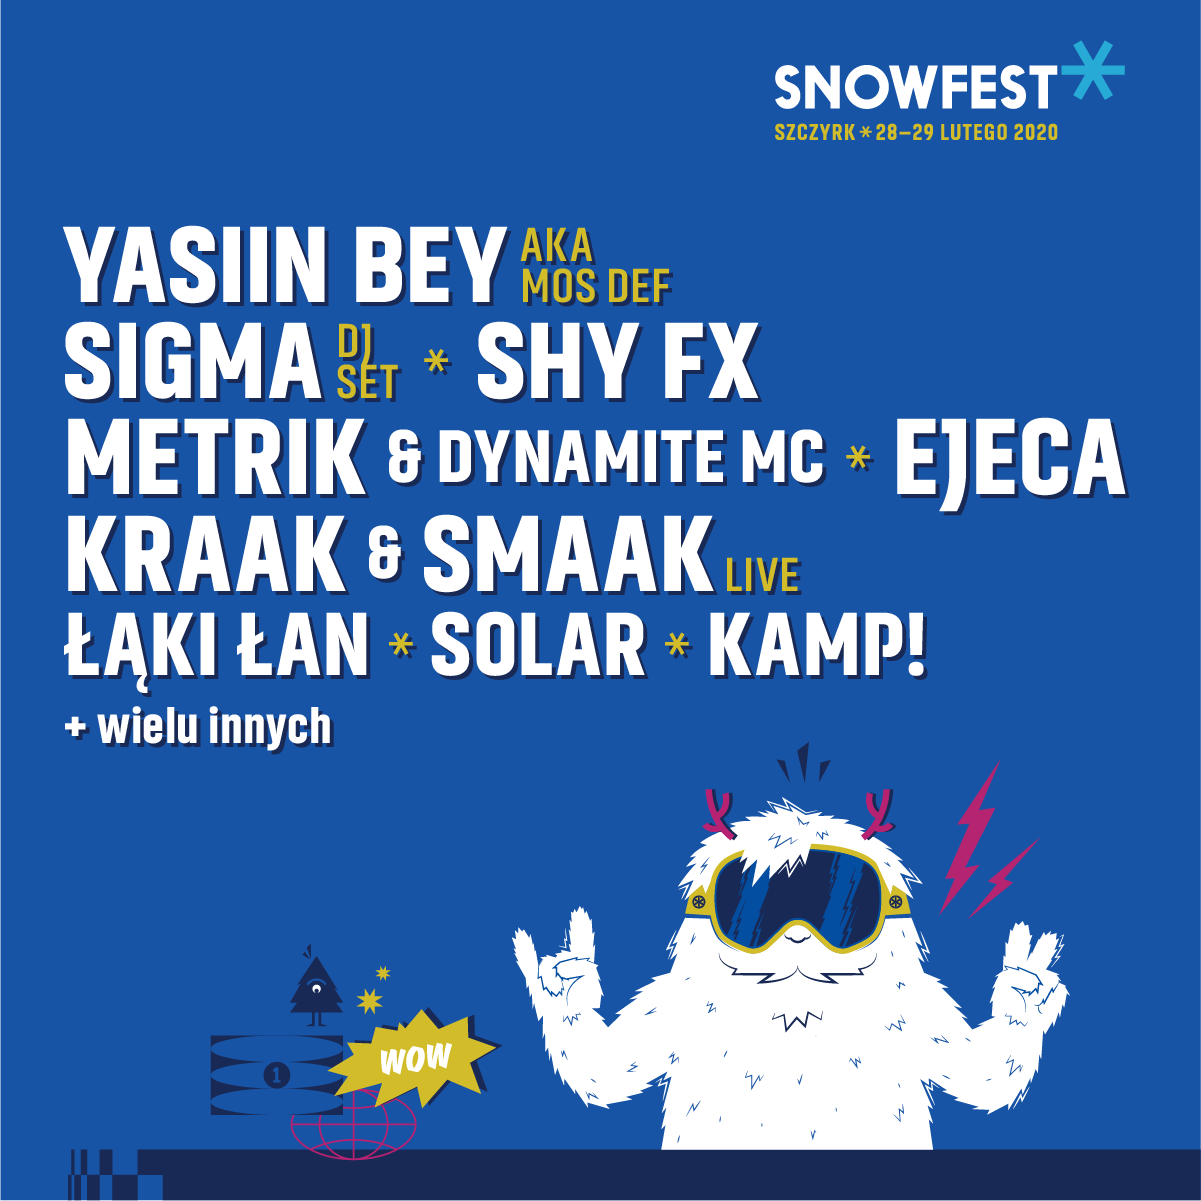 Yasiin Bey at Snowfest 2020